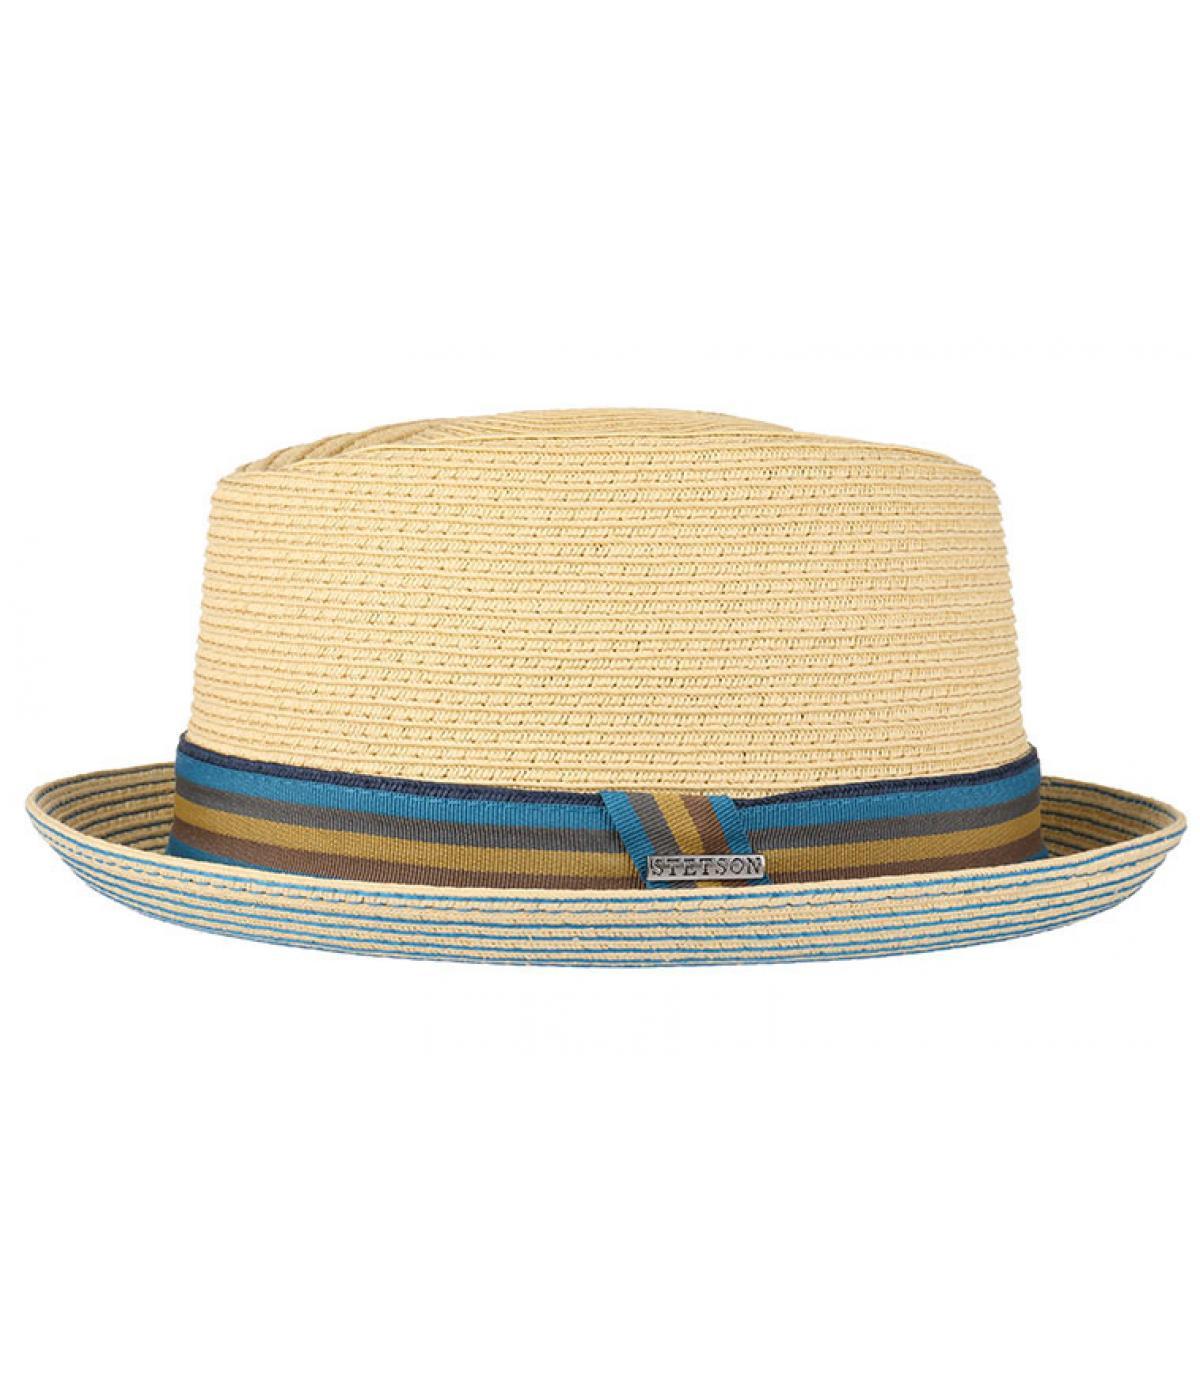 e51c23705587c9 Pork pie hat - Buy online pork pie hats.